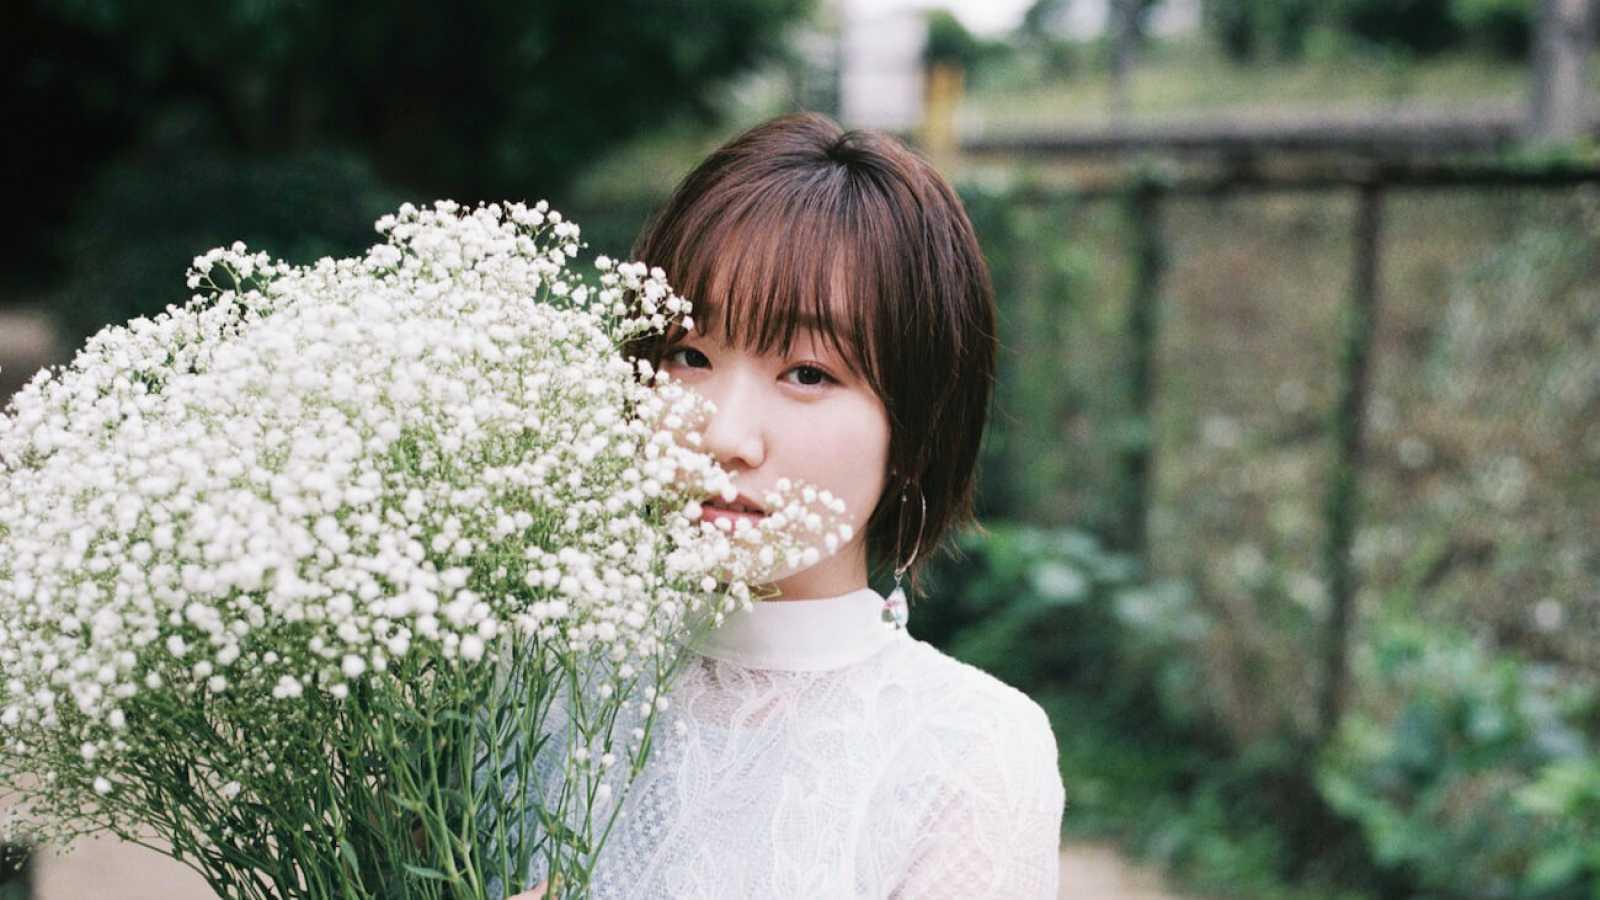 Новый сингл Azusa Tadokoro © BANDAI NAMCO Arts Inc. All rights reserved.